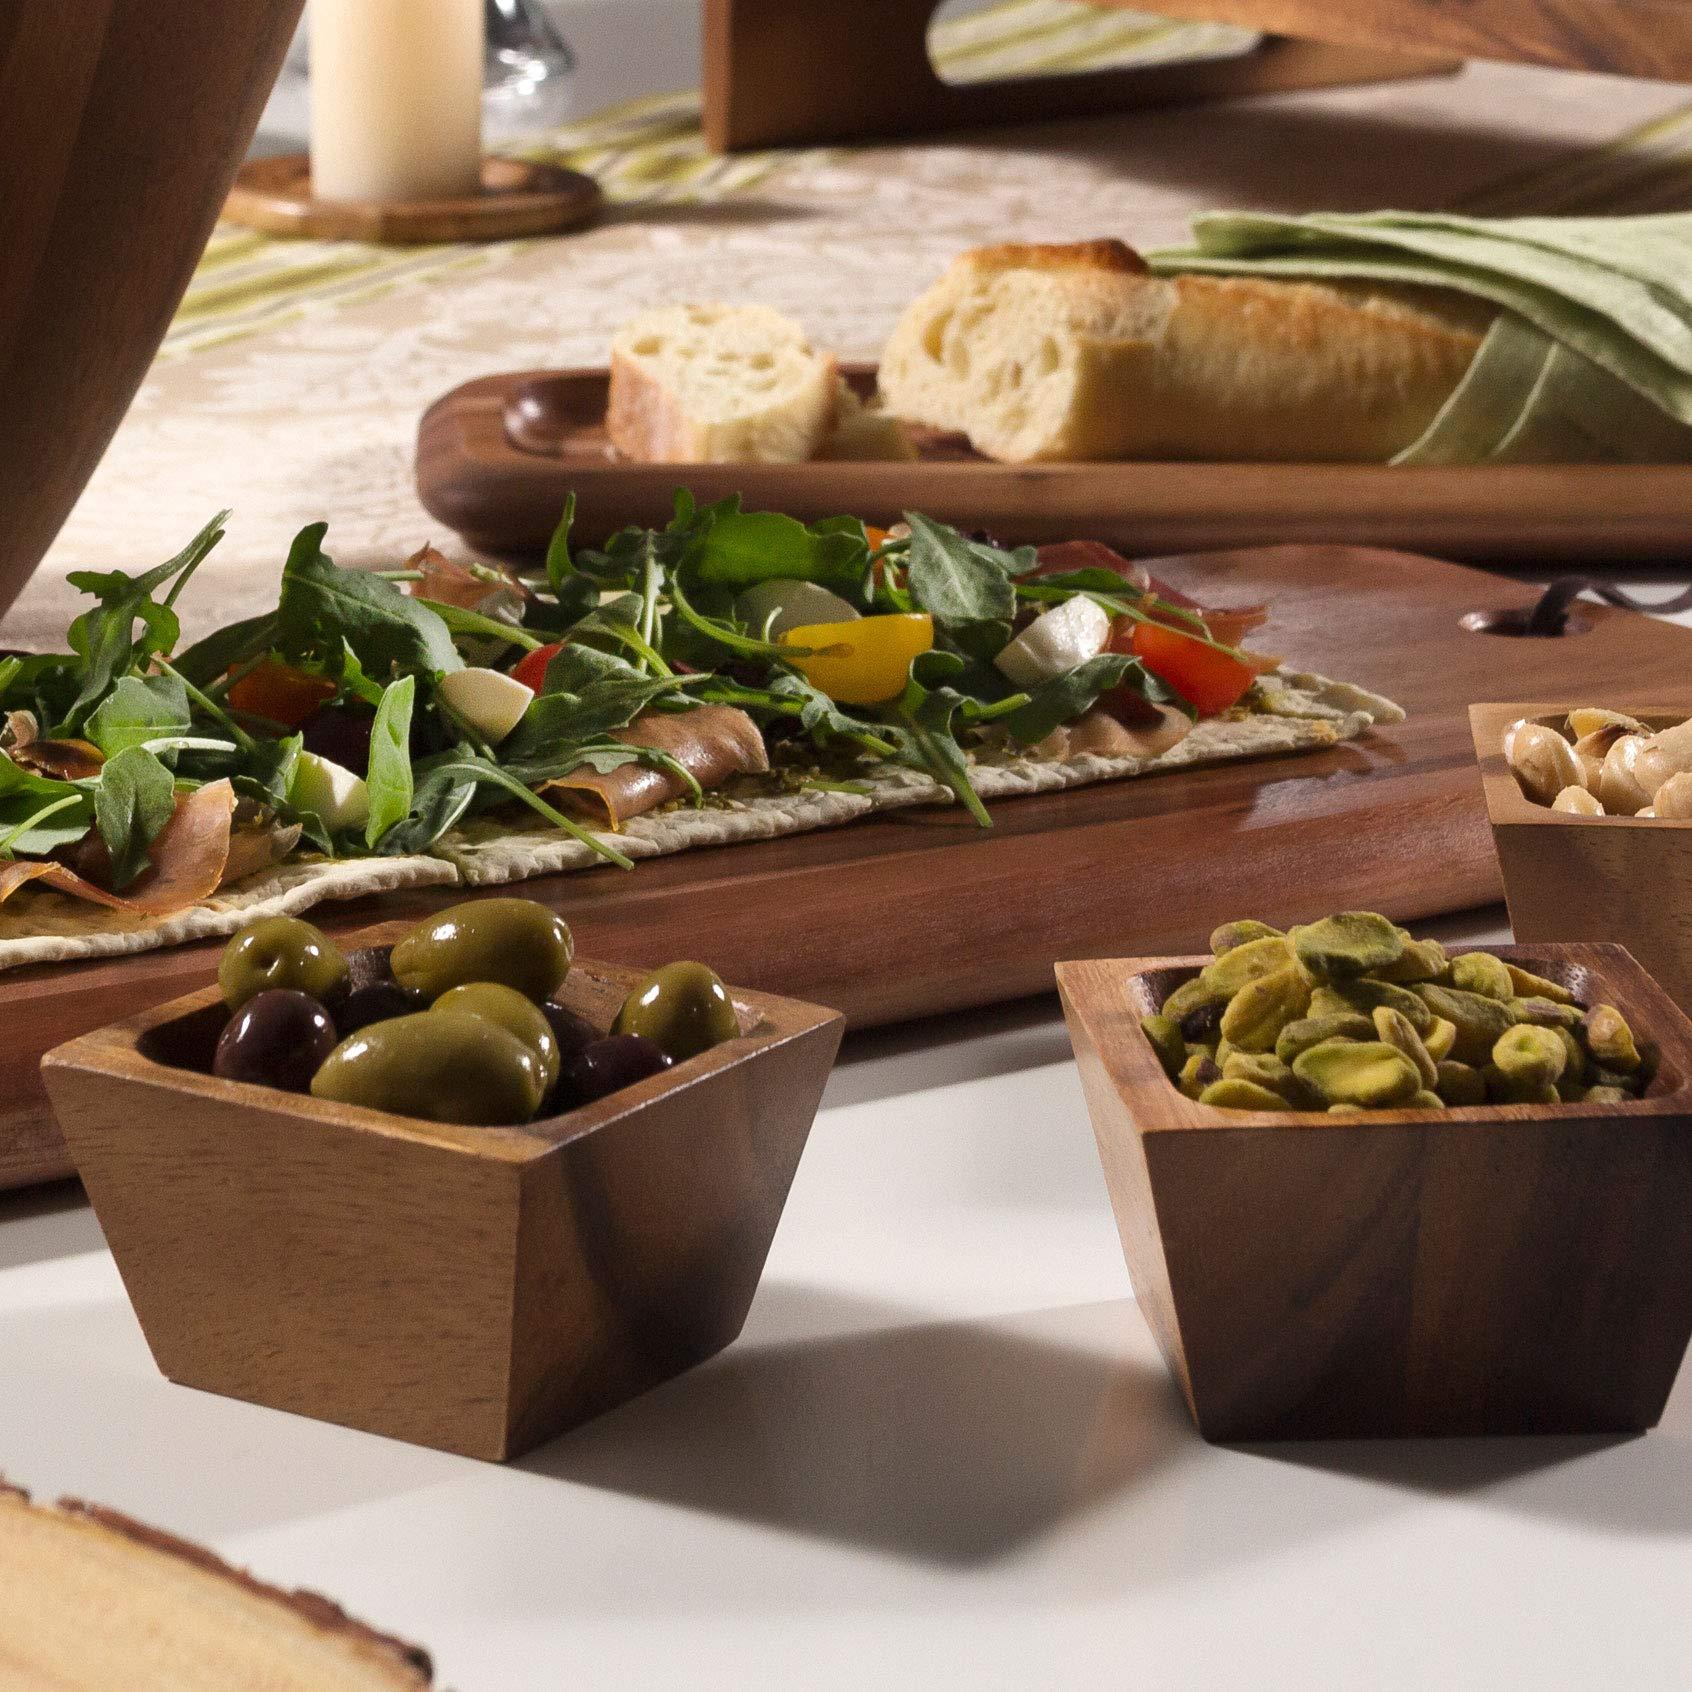 Lipper International 1100-2 Acacia Wood Square Salt Pinch or Serving Bowls, 3'' x 3'' x 2-1/2'', Set of 2 by Lipper International (Image #2)